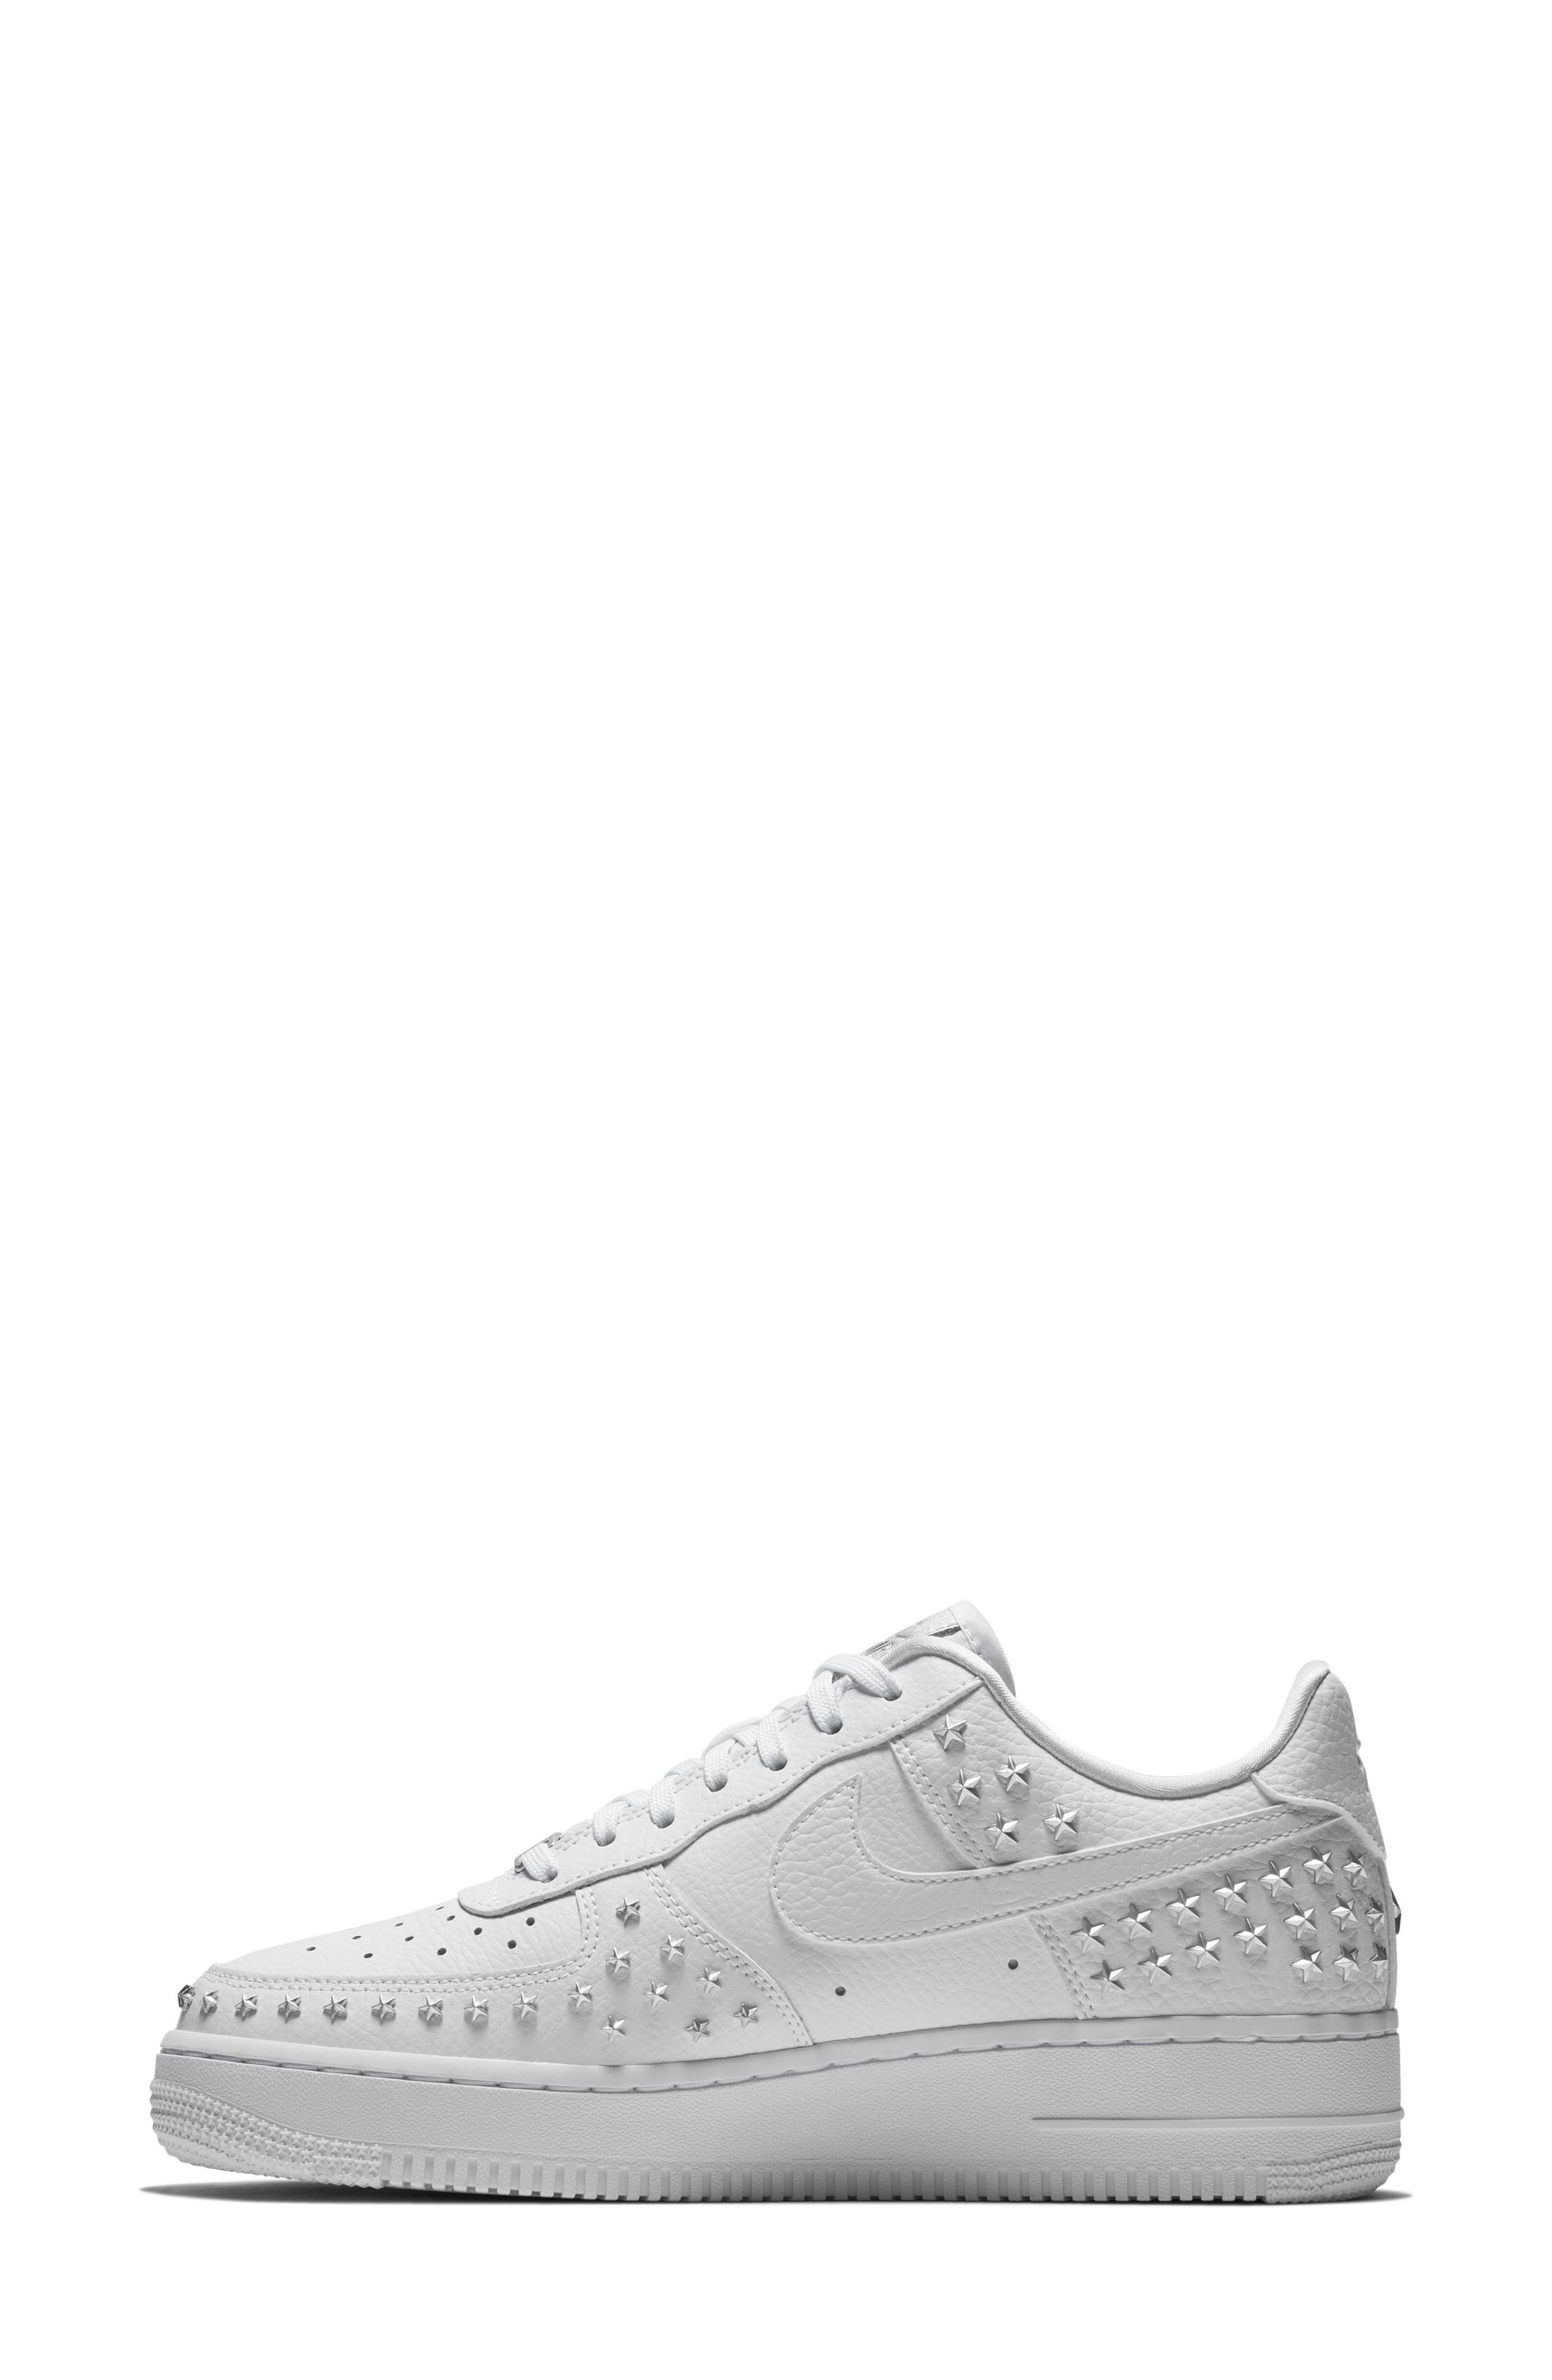 Air Force 1 '07 XX Sneaker,                             Alternate thumbnail 3, color,                             WHITE/ WHITE/ WHITE